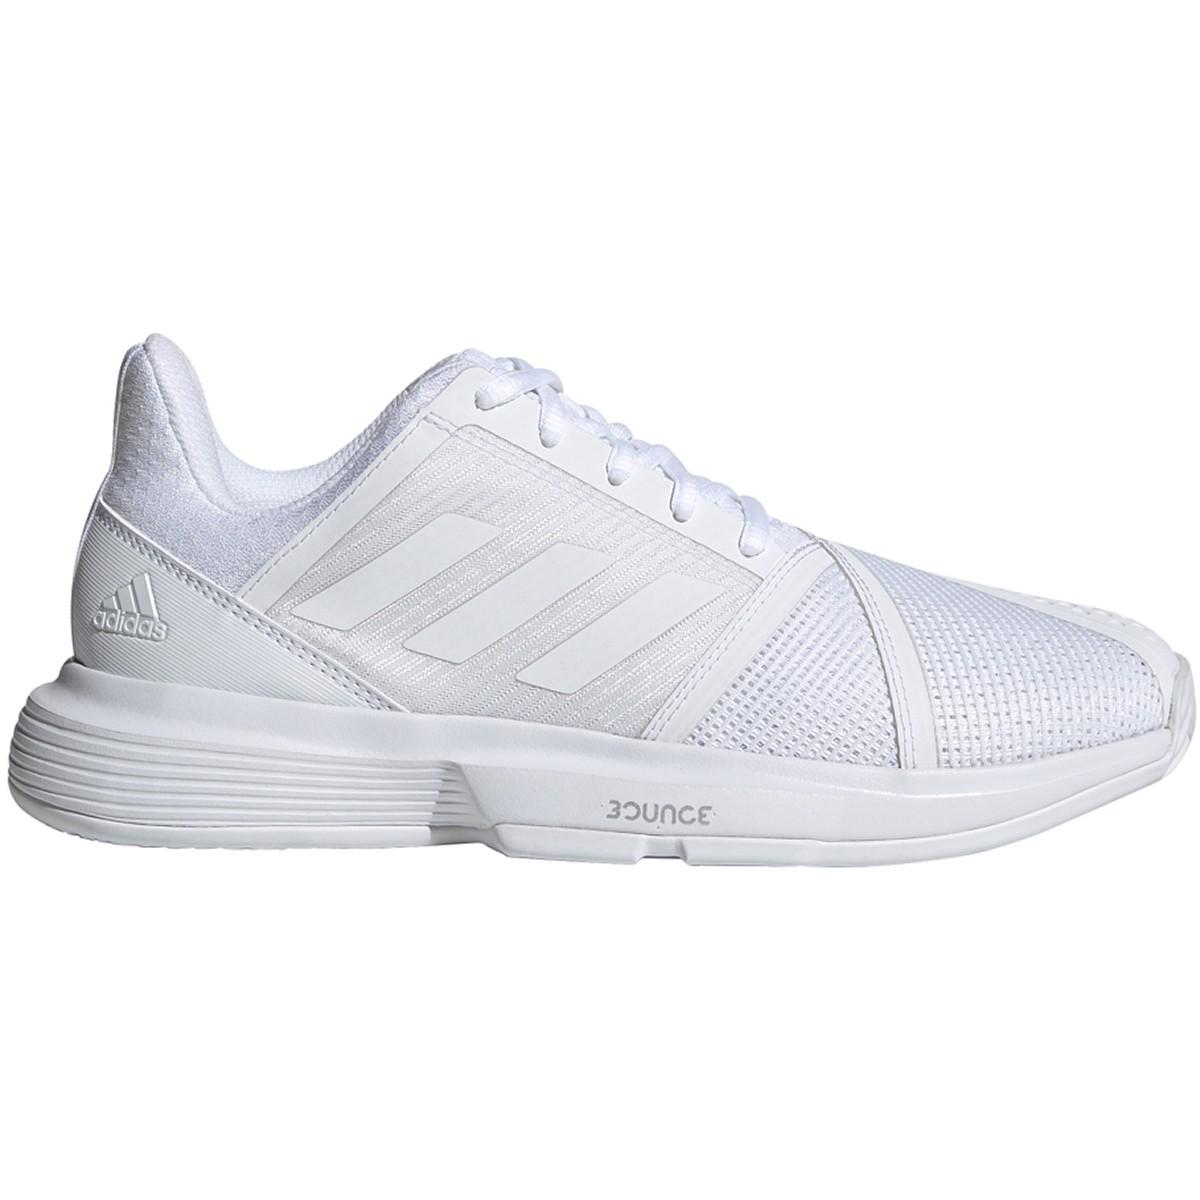 Adidas Women's CourtJam Bounce Tennis Shoes (White/Matte Silver) $73.95